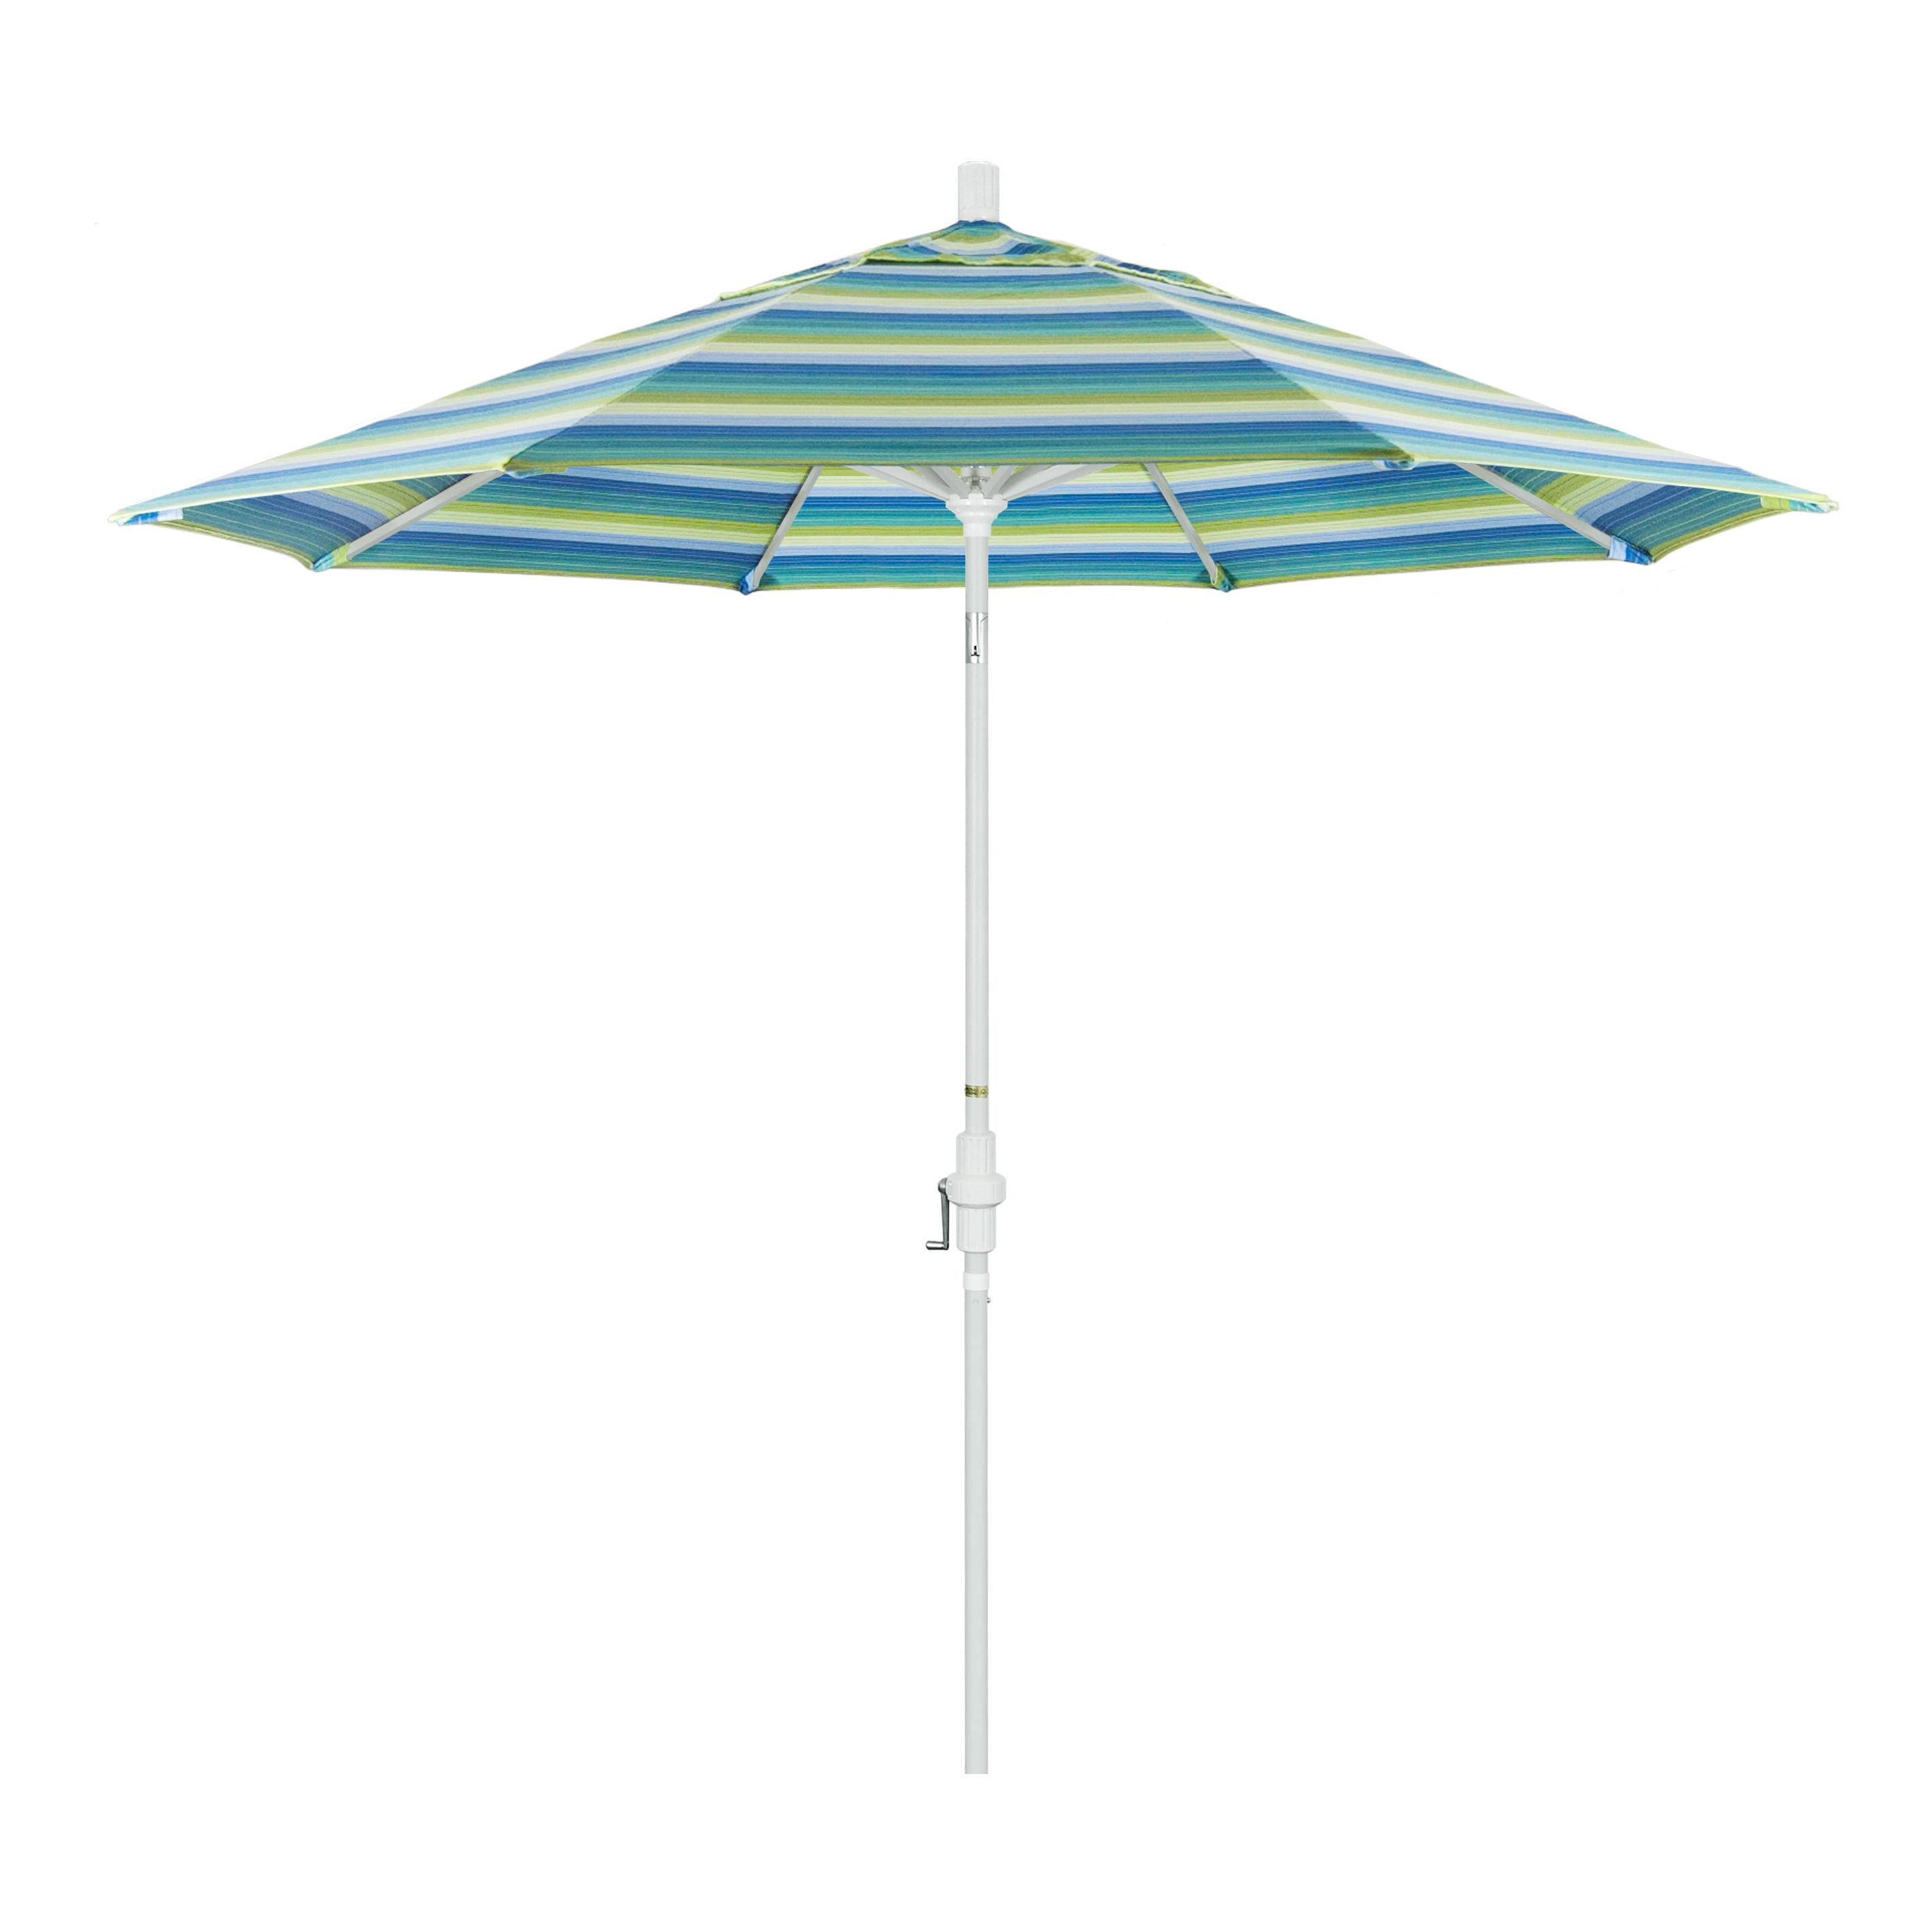 Most Recent Wallach Market Sunbrella Umbrellas Within Golden State Series 9' Market Sunbrella Umbrella (View 7 of 20)